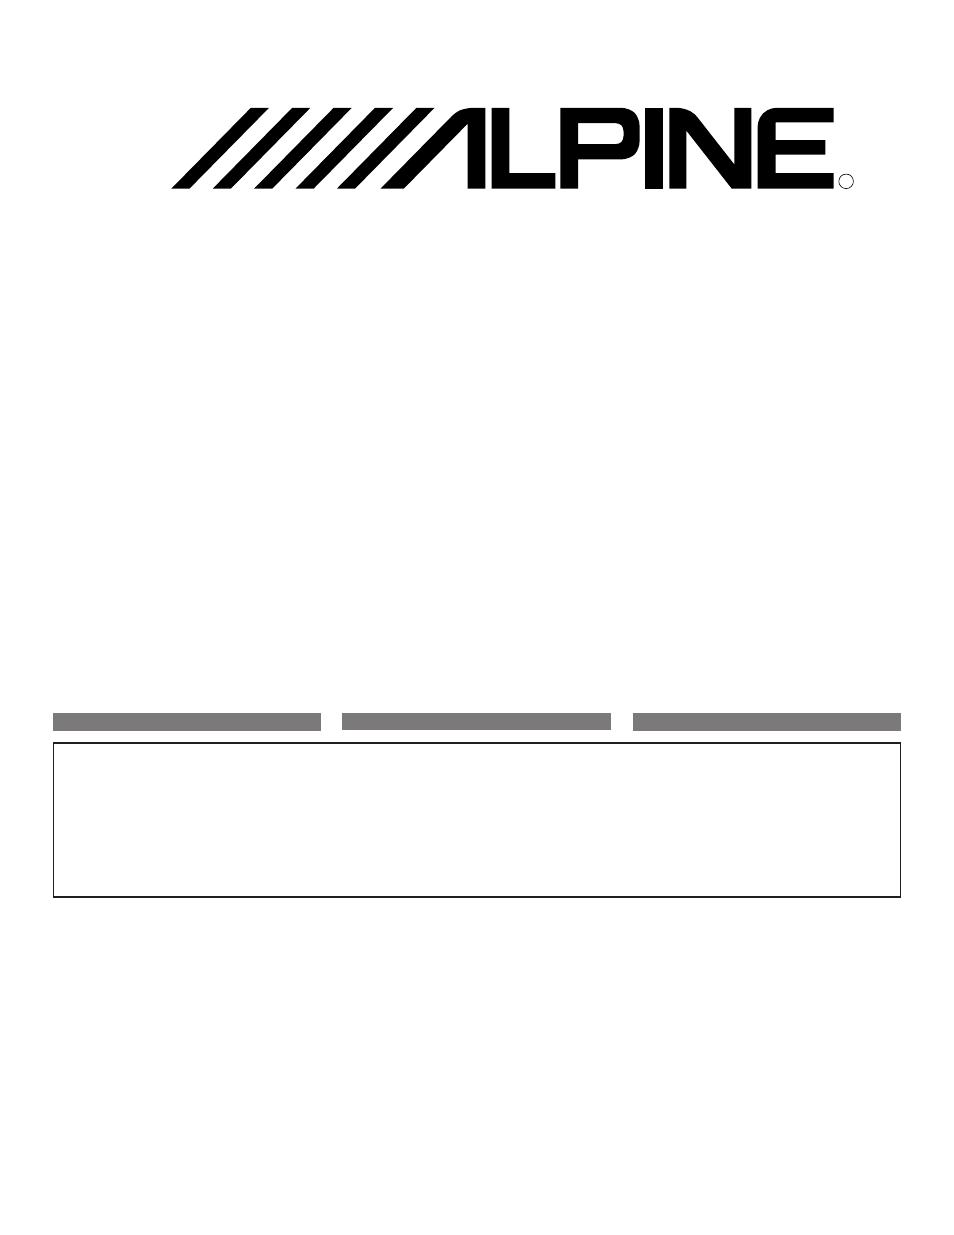 medium resolution of alpine mrv f450 user manual 20 pages original mode also for alpine mrp f450 wiring diagram